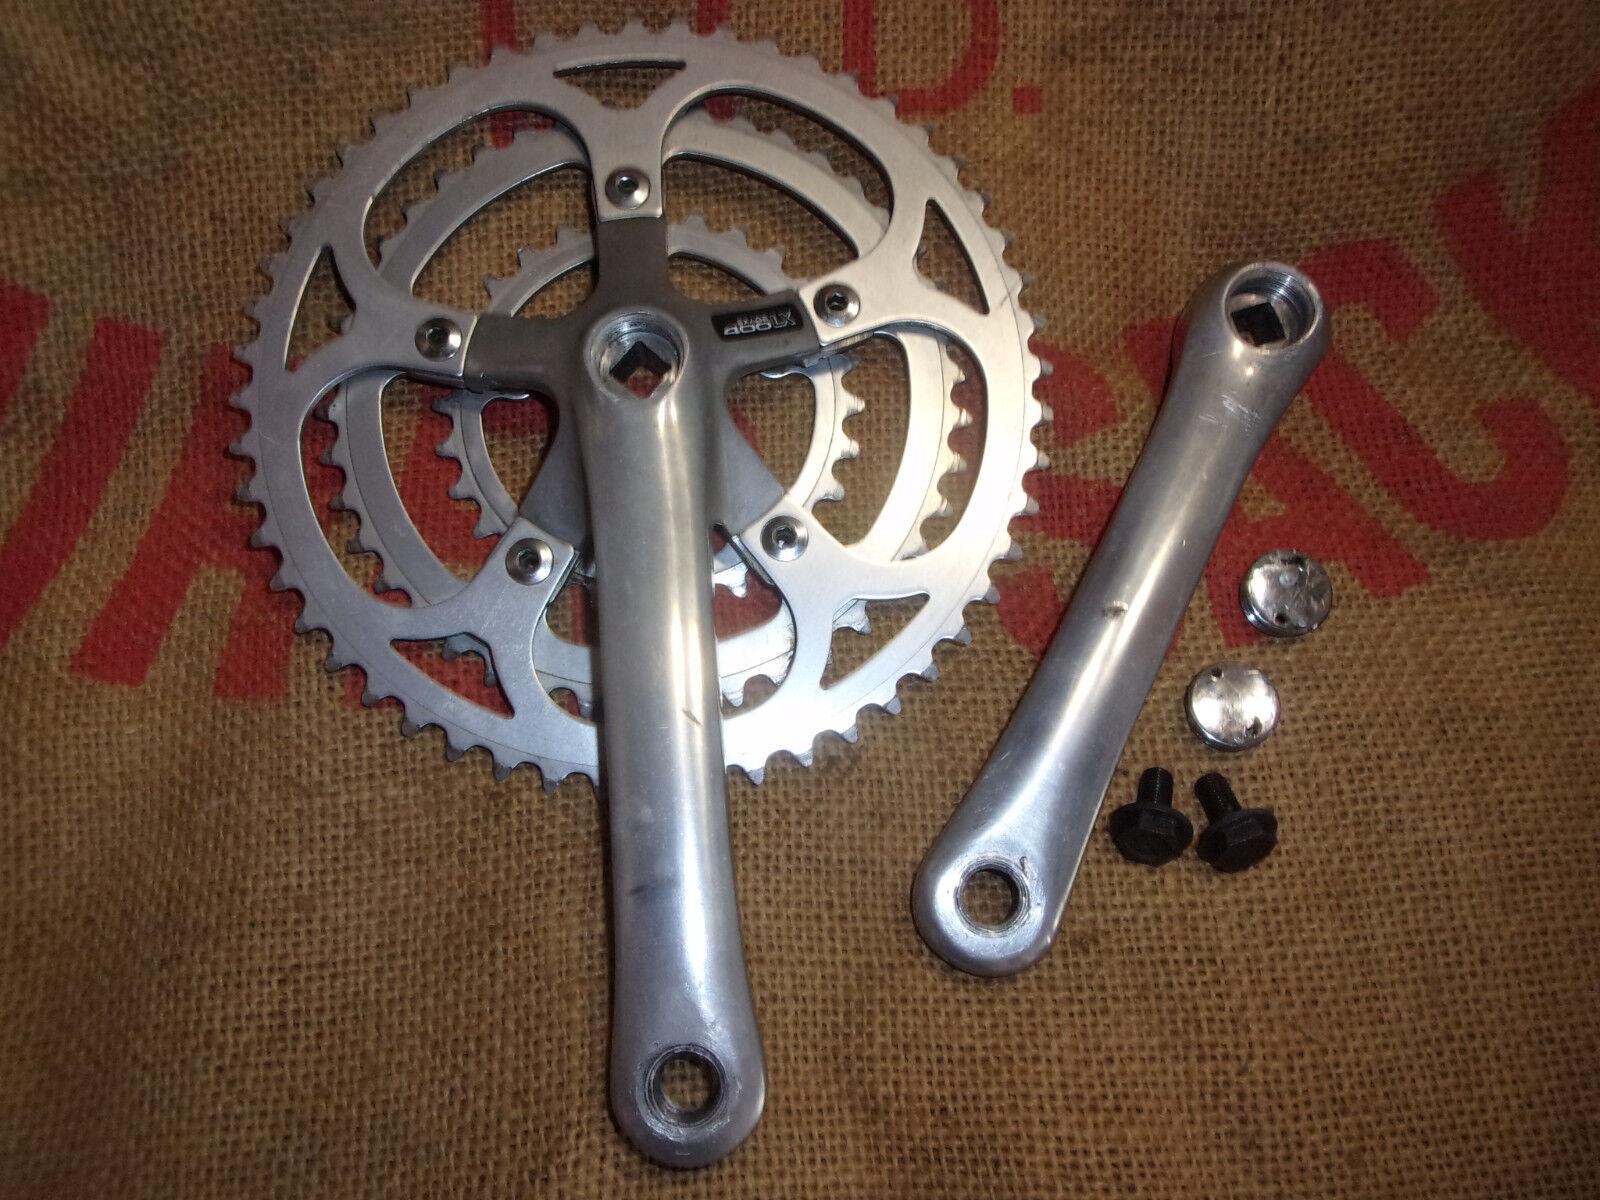 Pedalier triple SHIMANO Exage 400LX crankset vintage bicycle 524228  FCM400